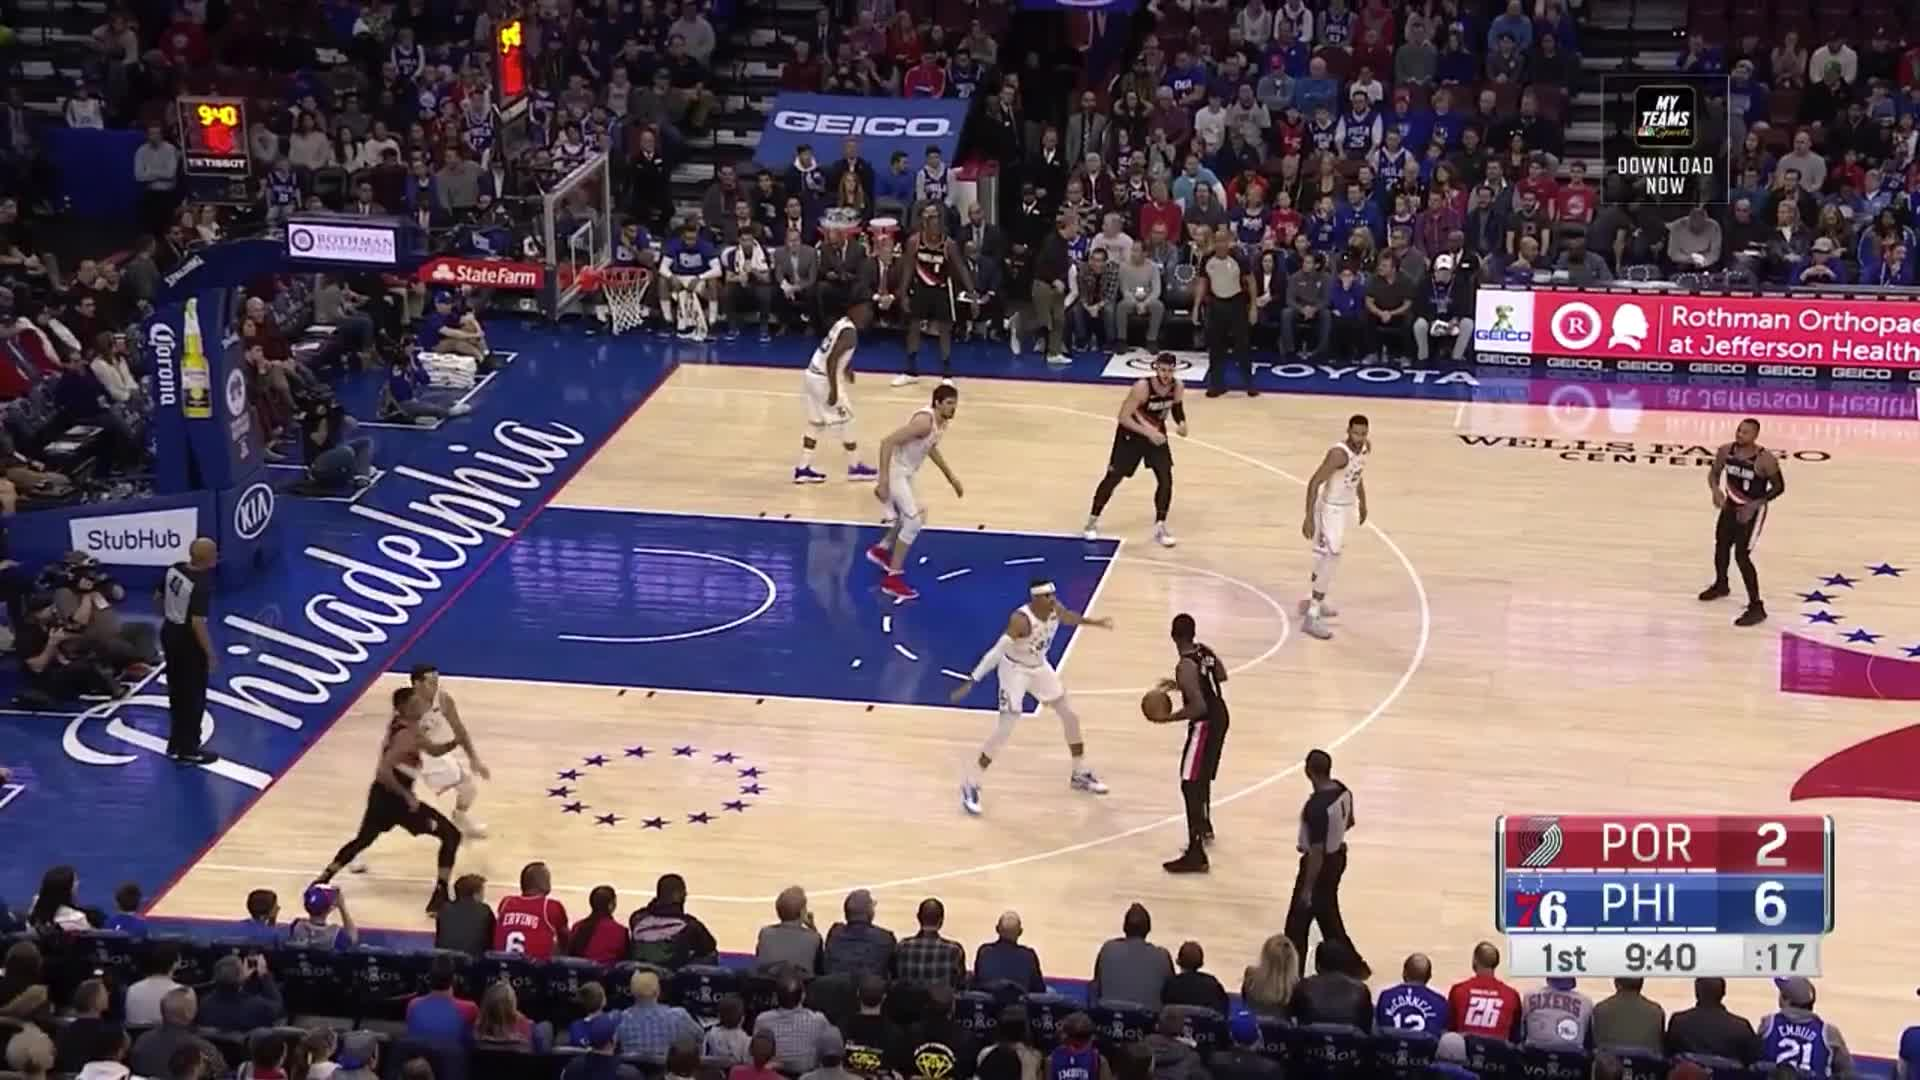 NBA, Philadelphia 76ers, Portland Trail Blazers, basketball, Boban standing still GIFs